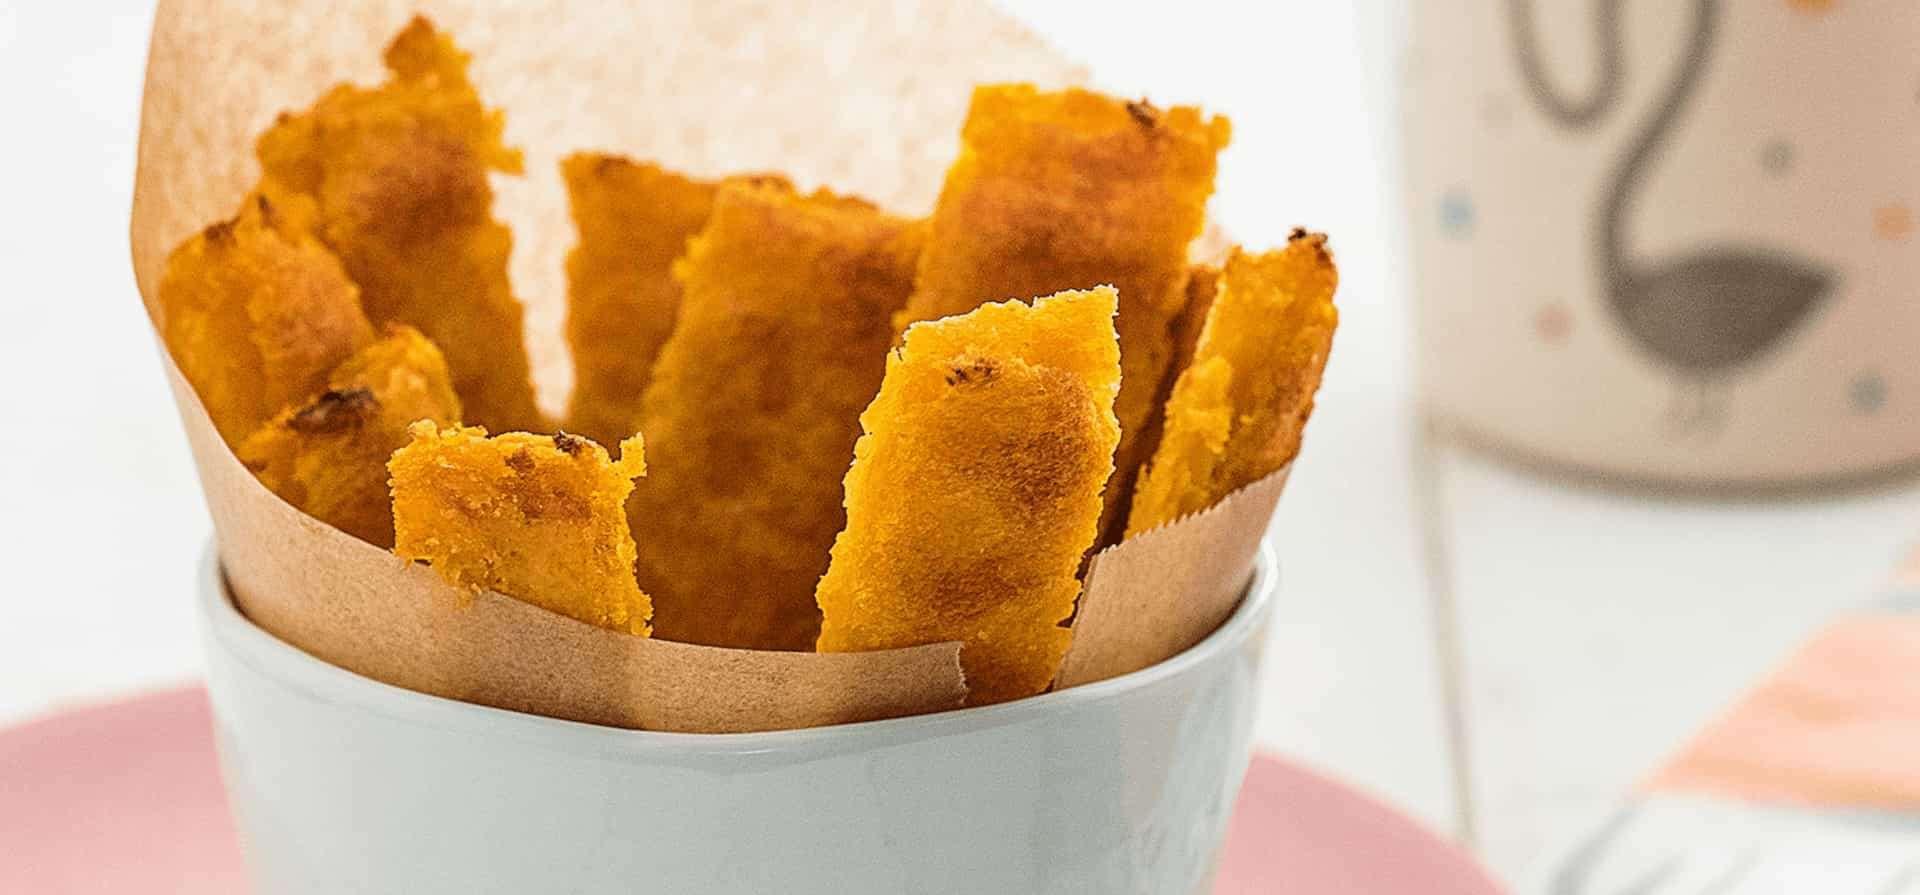 Recipe Polenta and sweet potato fries